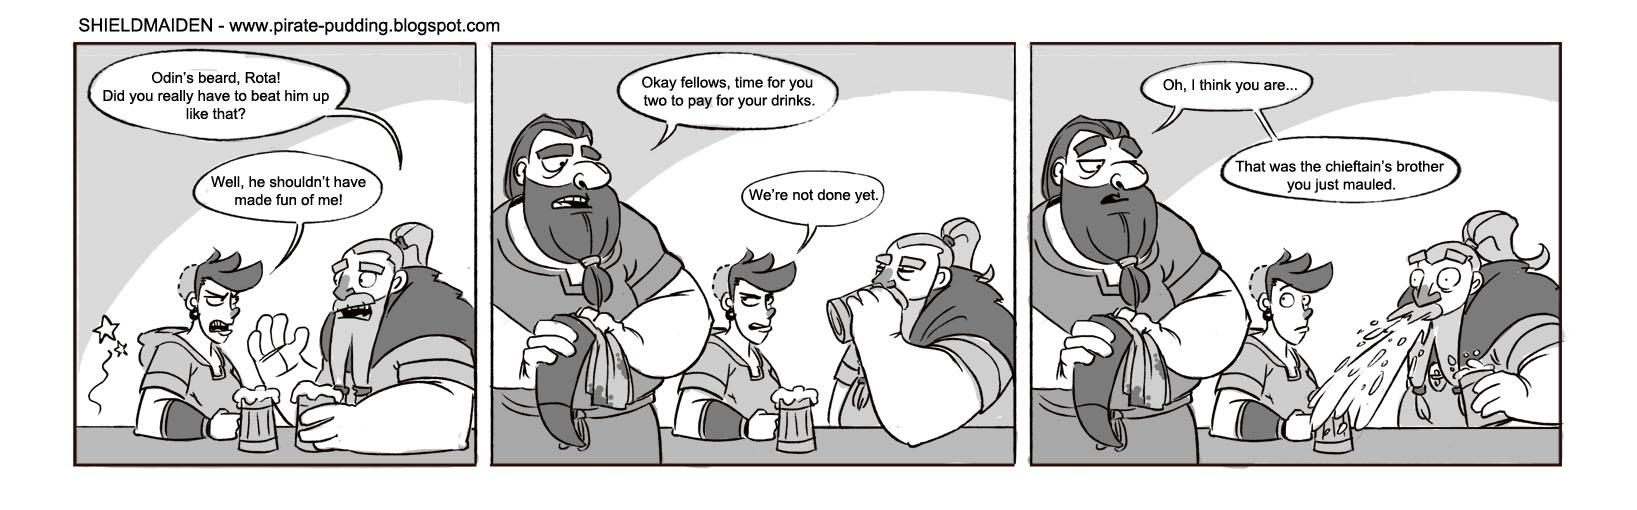 Shieldmaiden comic 002